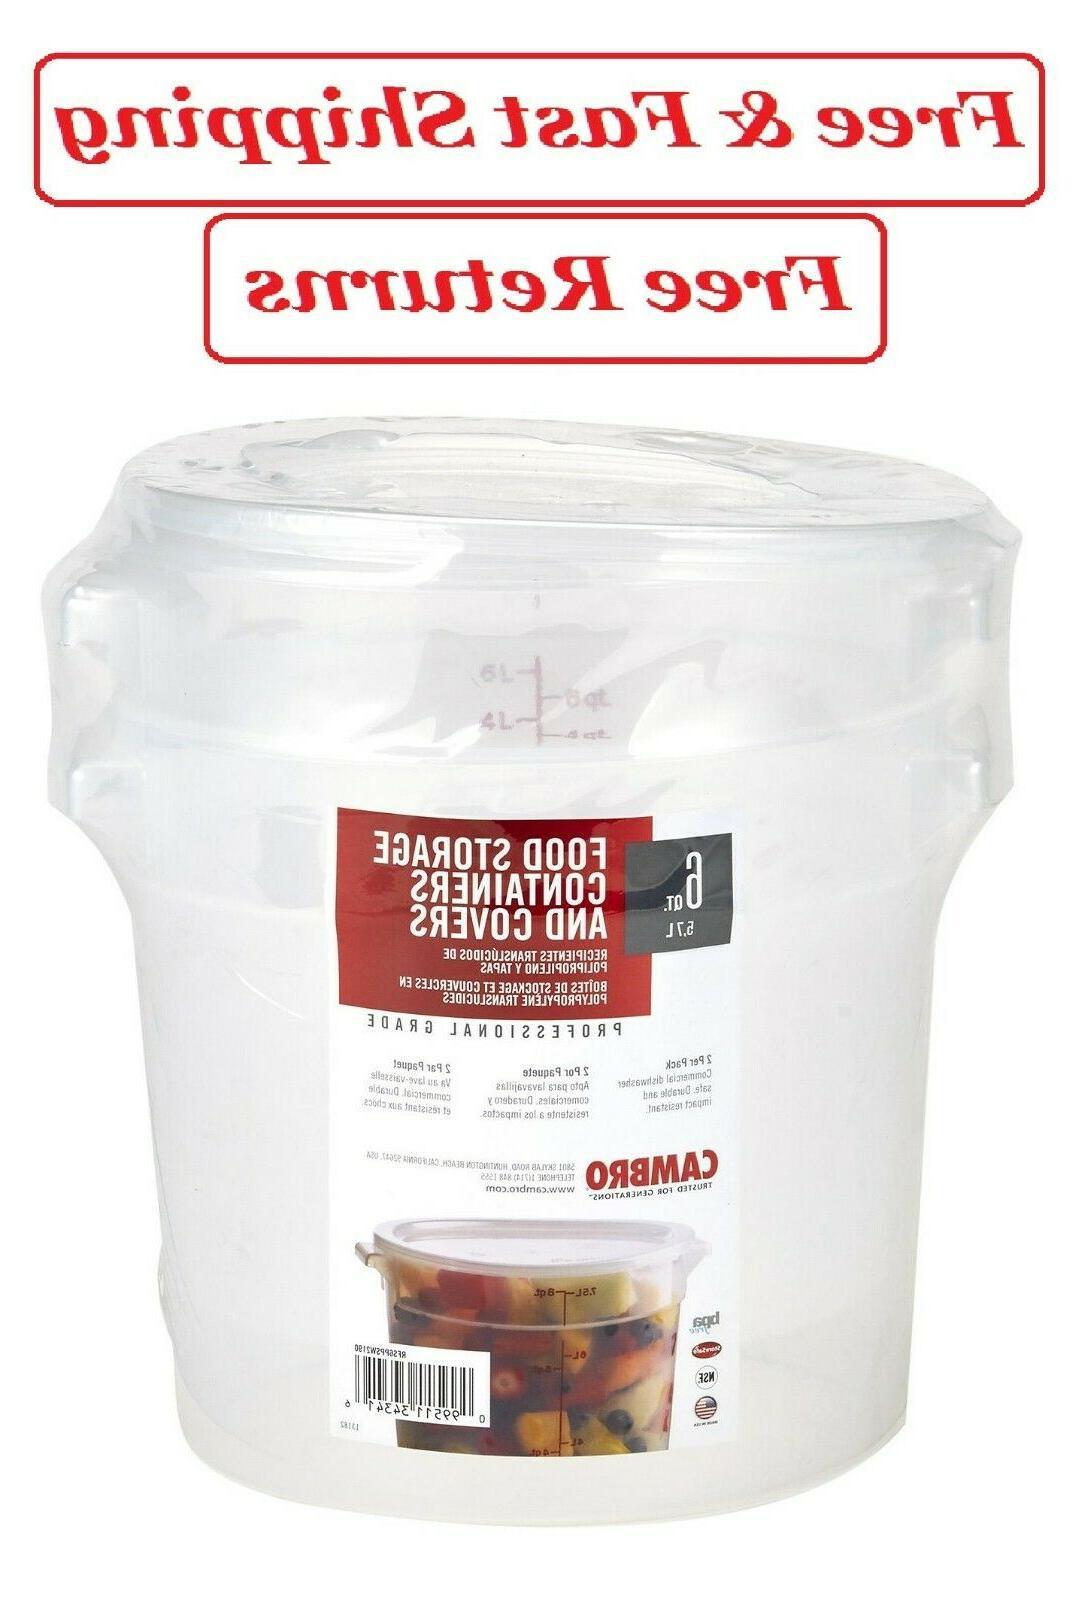 Cambro RFS6PPSW2190 6-Quart Round Food-Storage Container wit